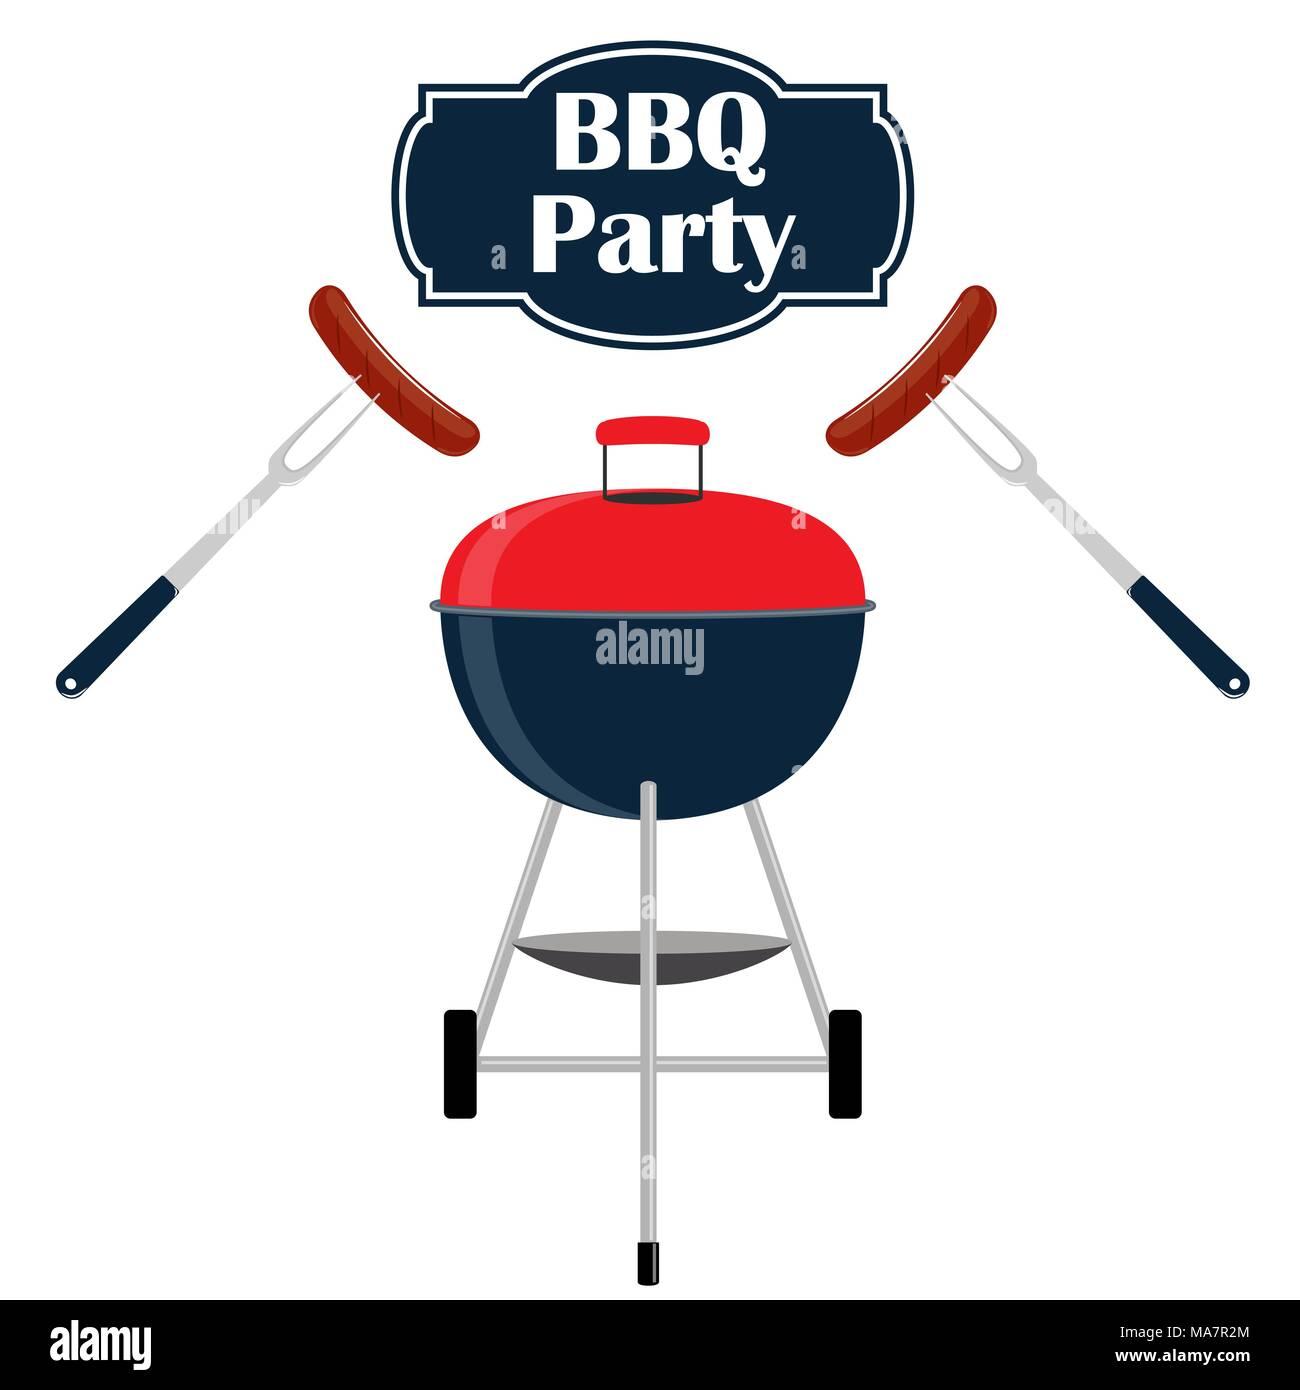 barbecue party invitation card design template barbecue sausage